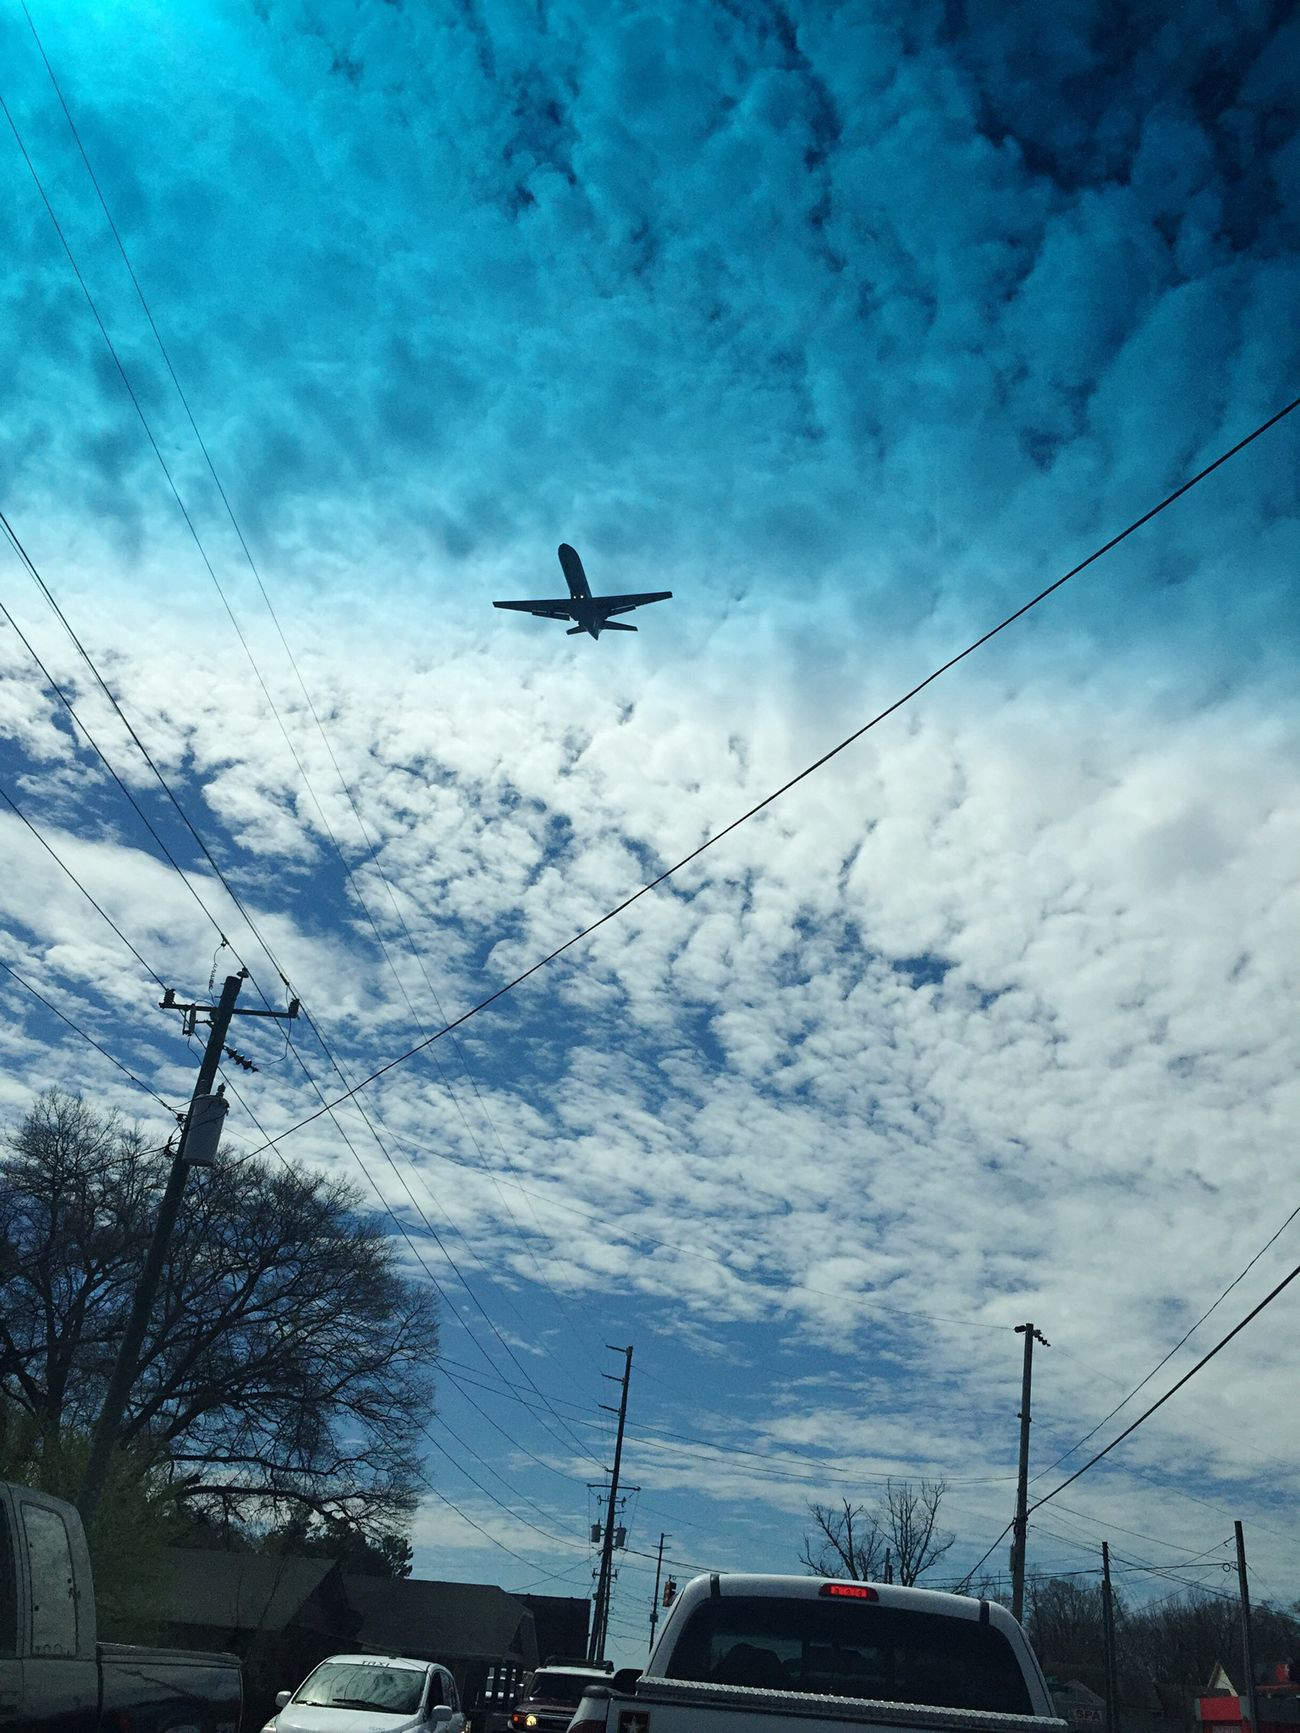 Airplane Sky Clouds Beautiful Sunny